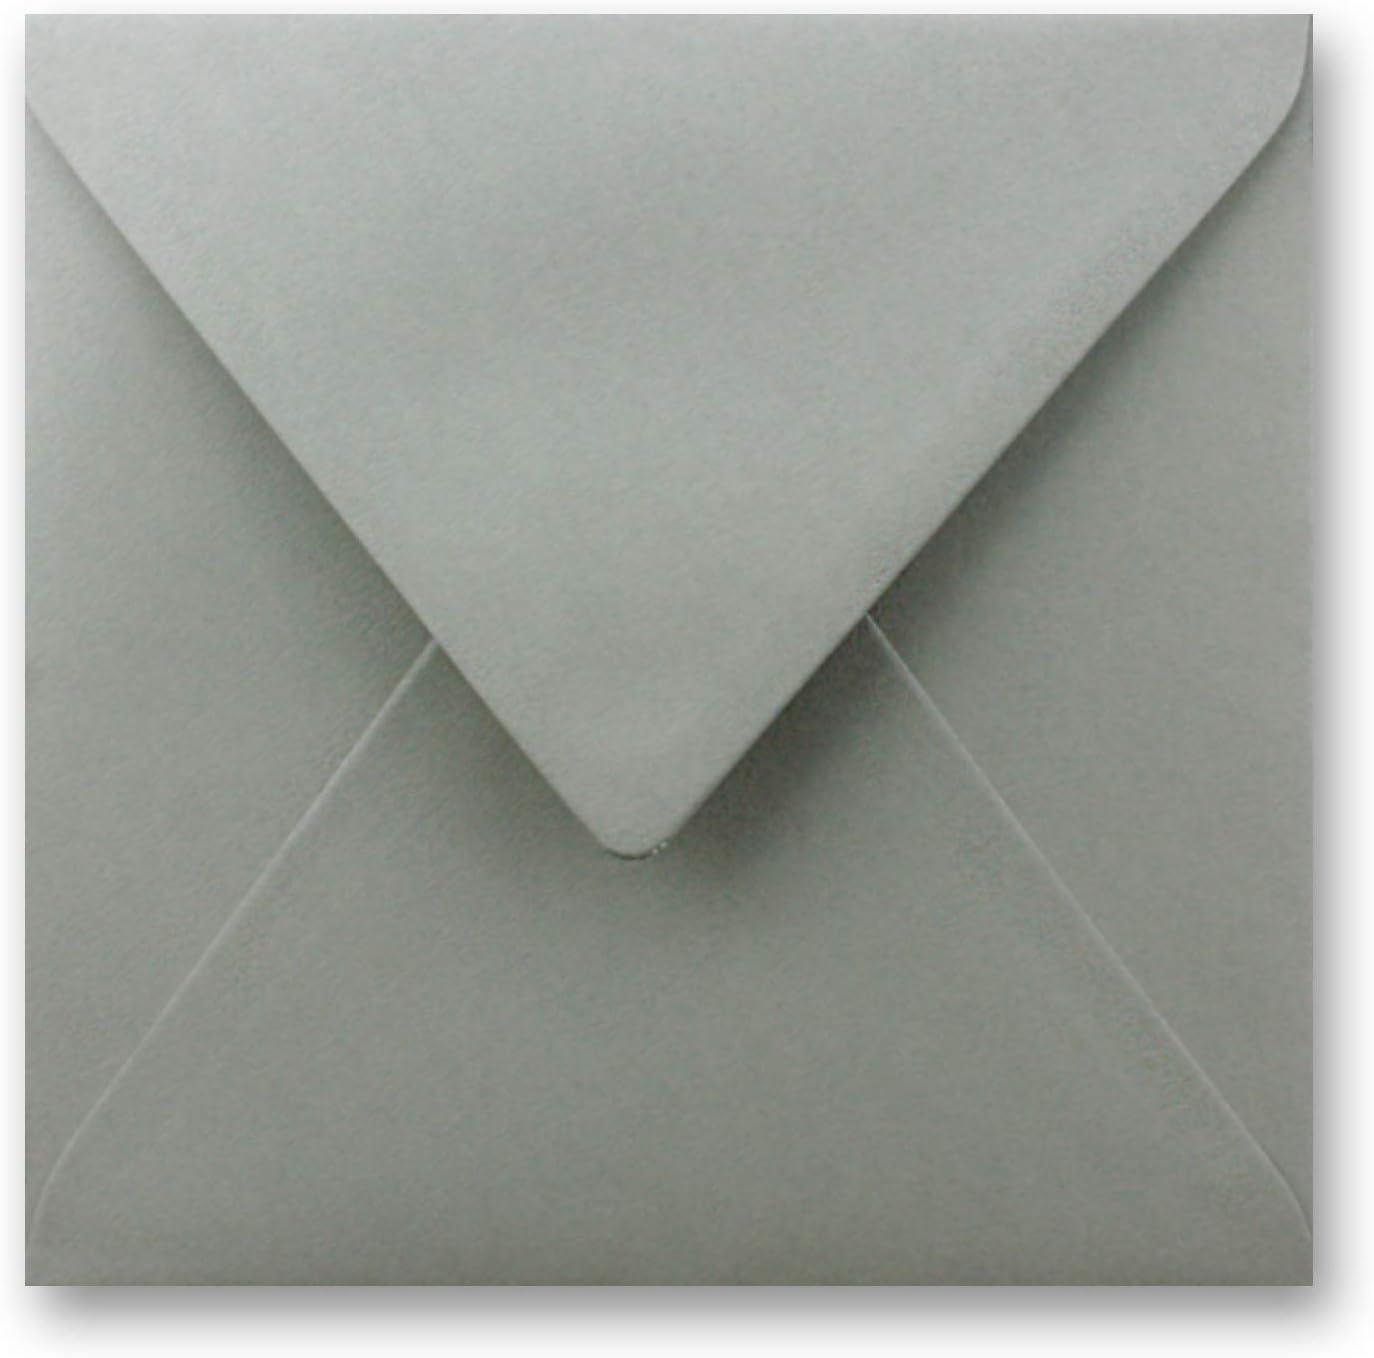 Buste quadrate,//Nero /molto resistente/ nassklebung 158/X 158/mm pizzo Patta////AUS der Serie colore froh von neuser /110/G//M/² 25 Umschl/äge nero pesante qualit/à/